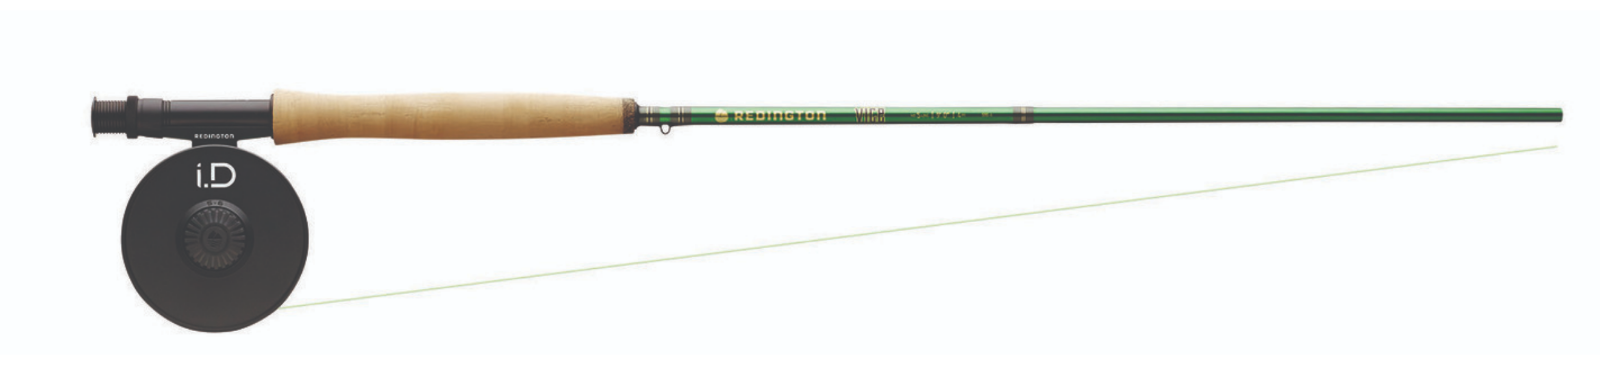 rotington VICE 790-4 Fliegen Fishing Rod & Reel Combo 6wt 9'0  4pc